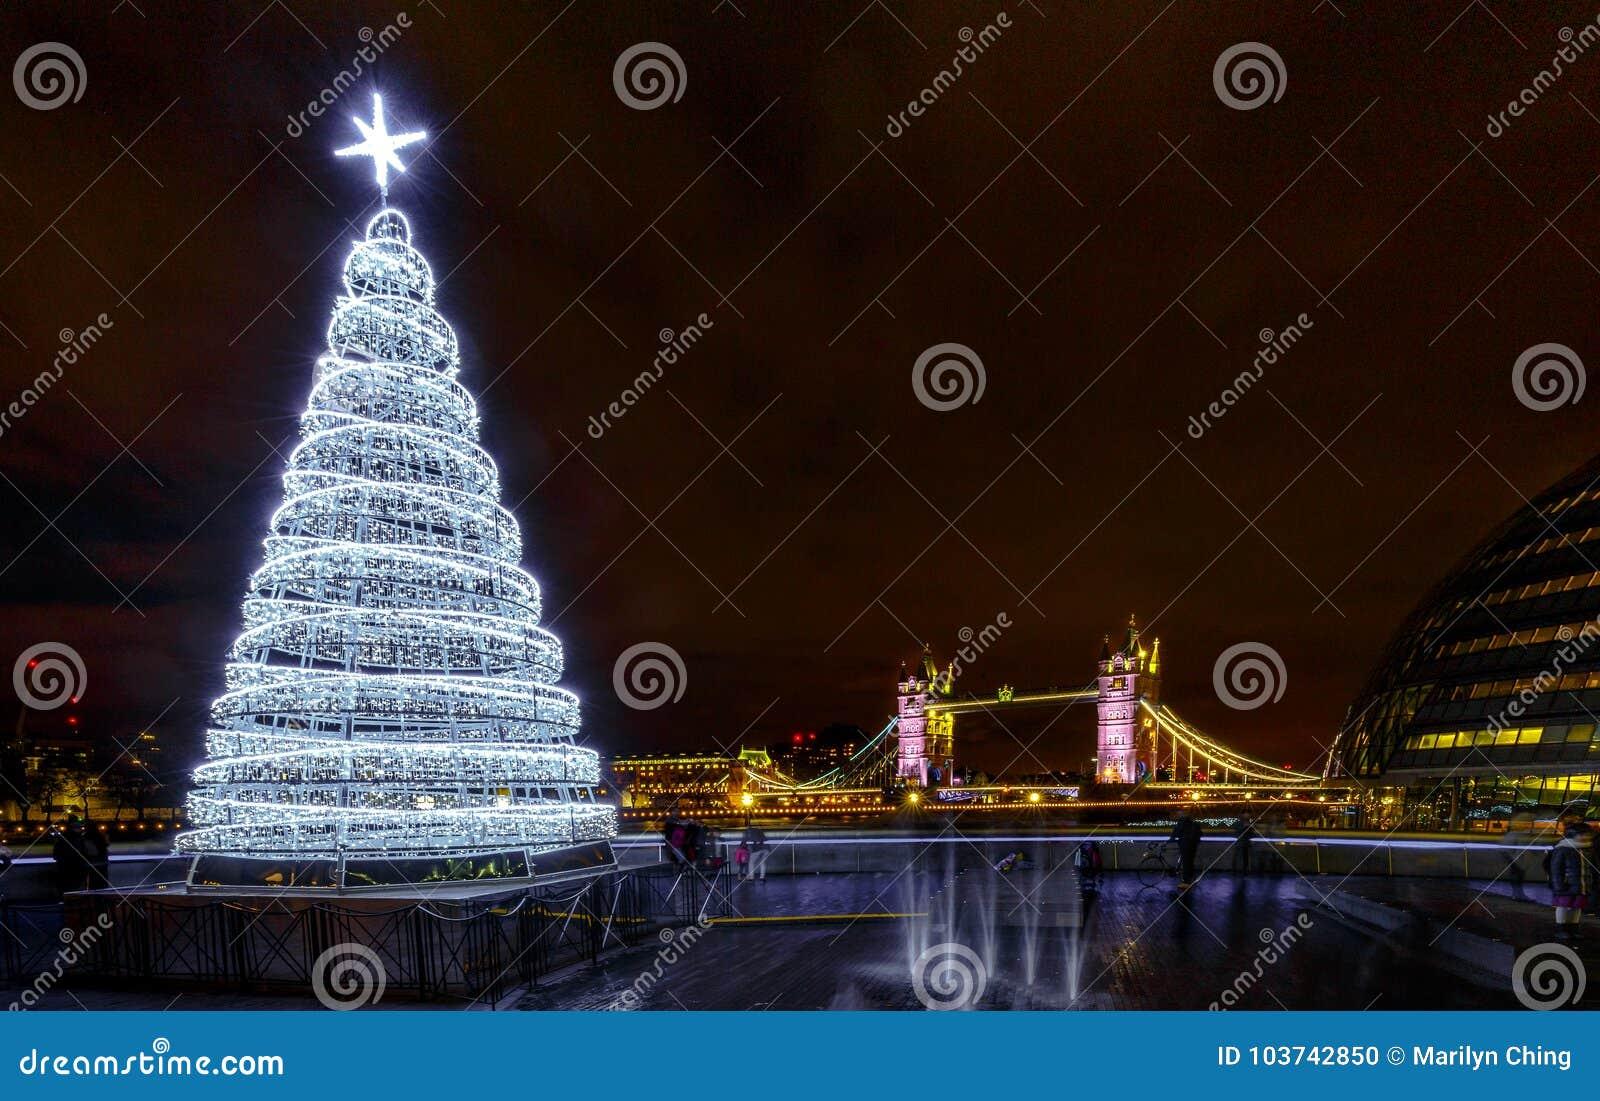 Weihnachtsbilder New York.Tower Bridge And Christmas Holiday Lights London England Editorial